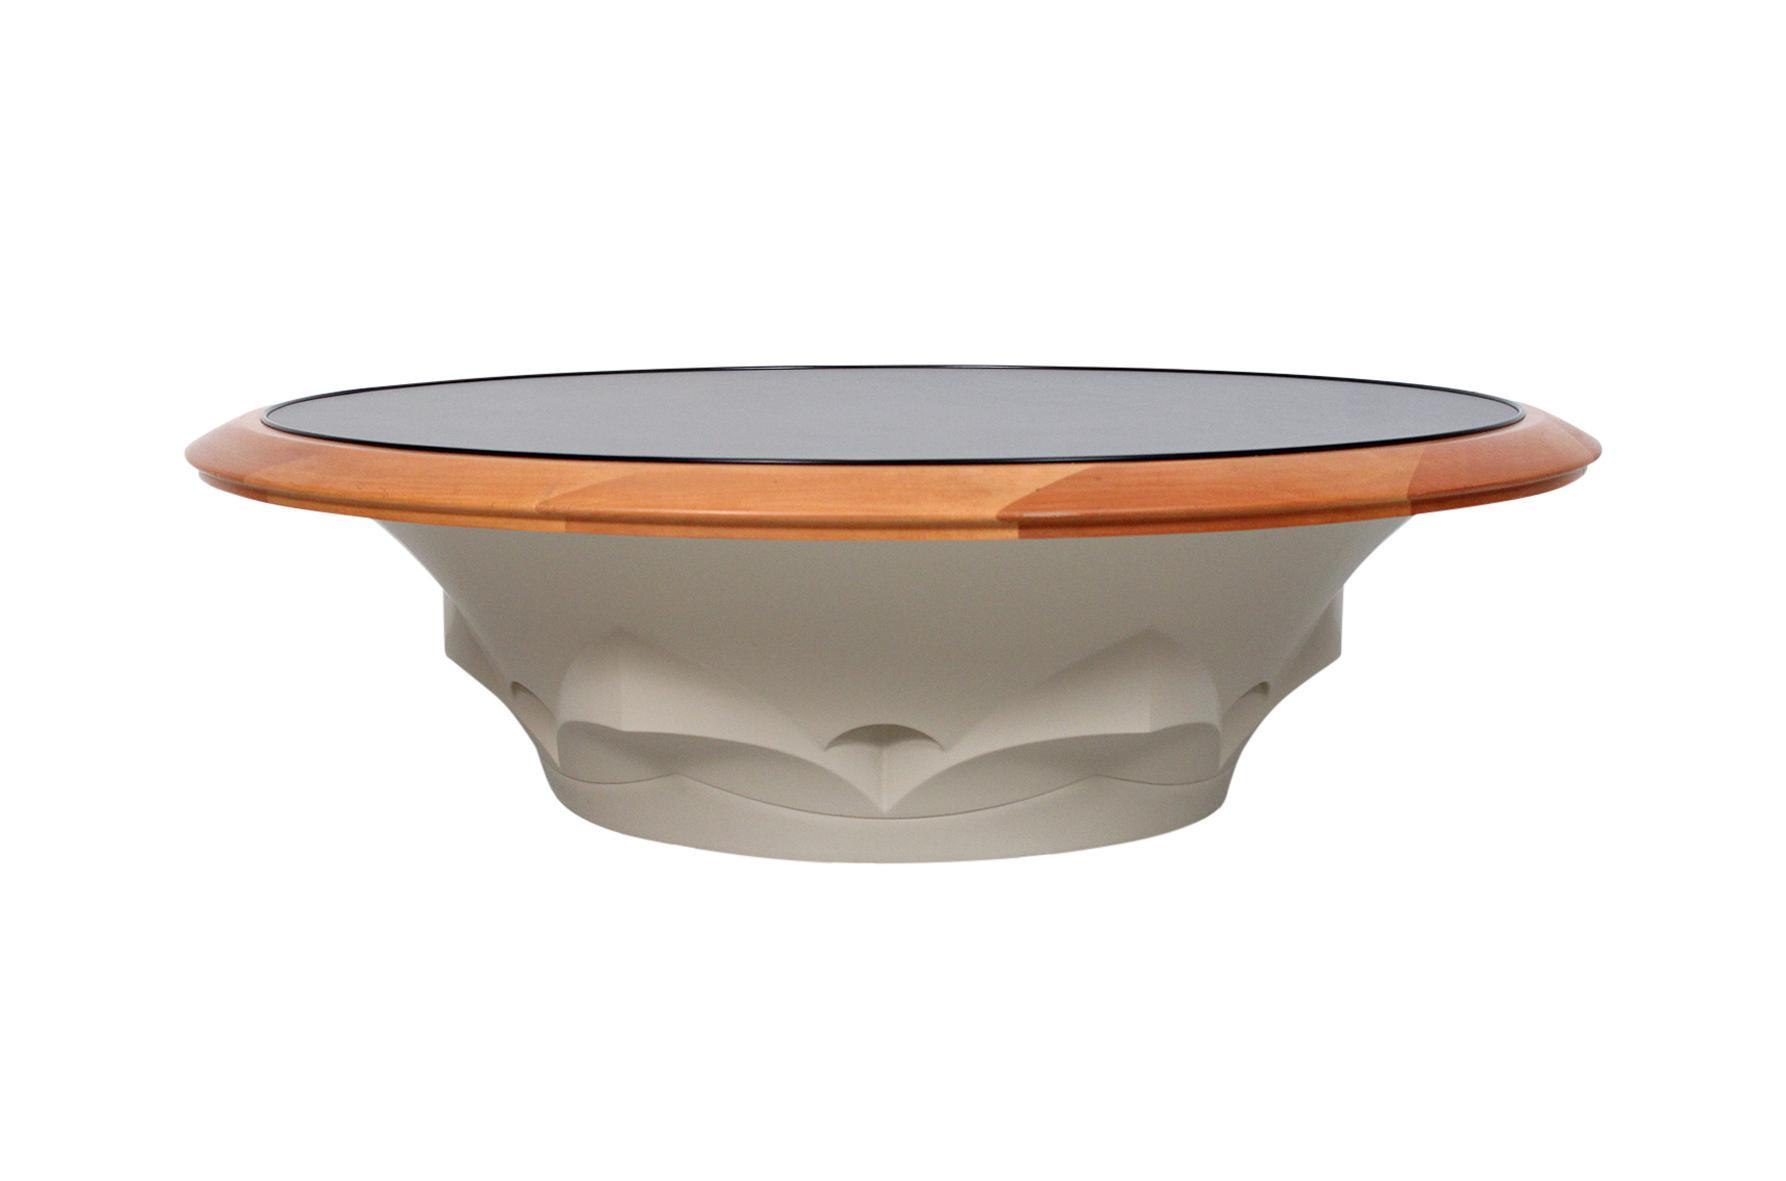 Eighties U0027Corinthianu0027 Coffee Table Designed By Robert Venturi For Knoll.  This Design Was